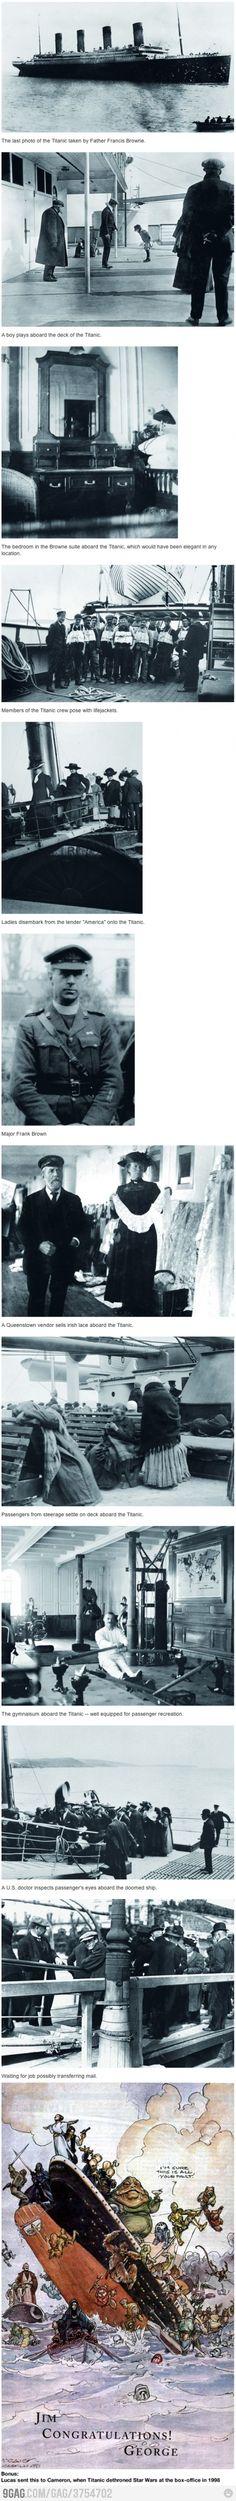 The real titanic.